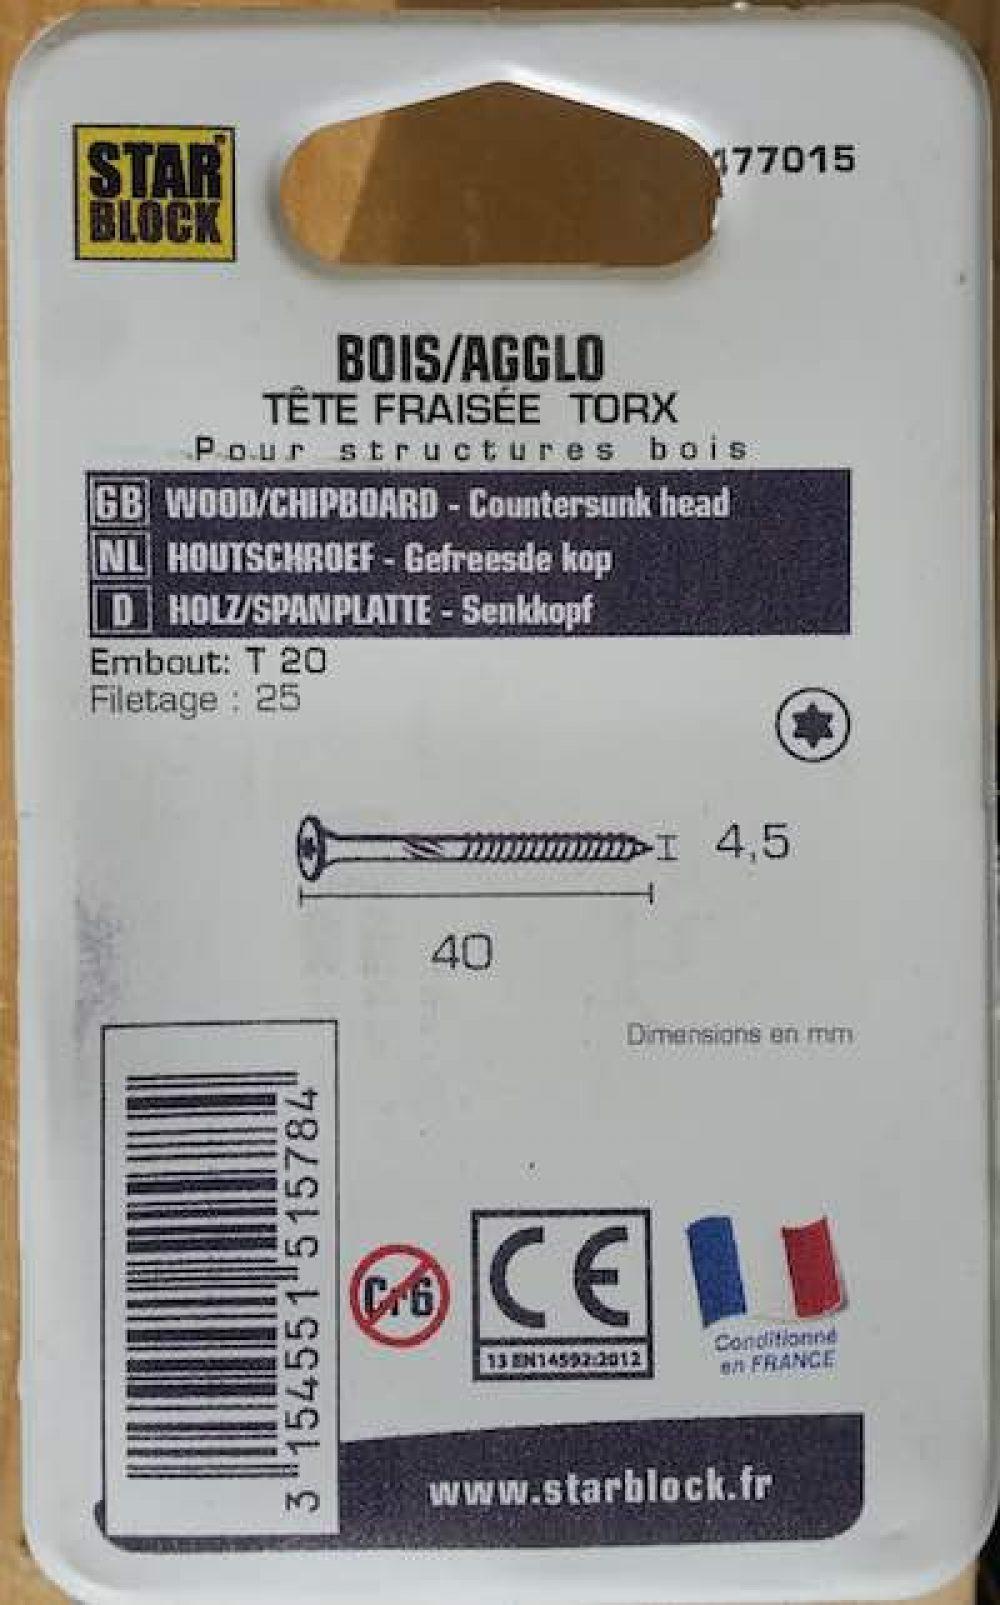 Boite 50 vis starblock 4,5x40 mm acier zingue fraisee torx verso